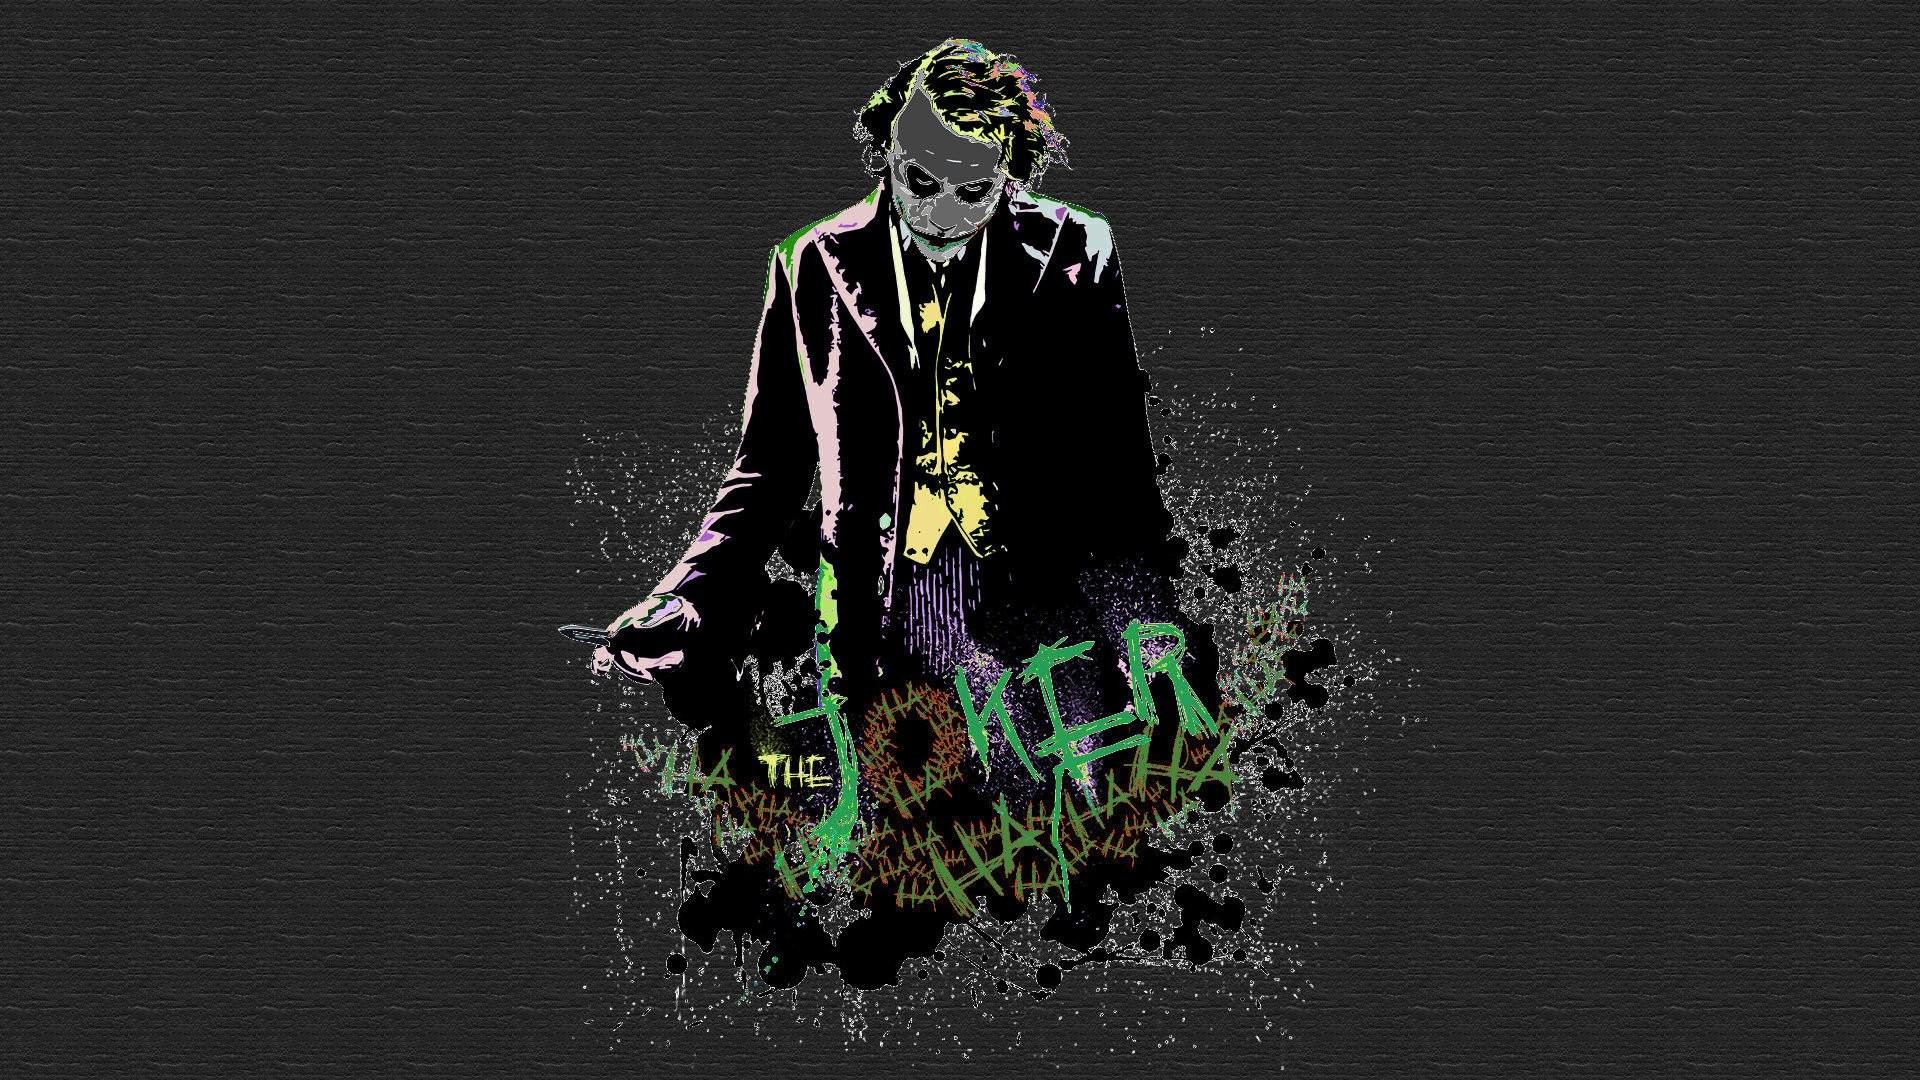 Heath Ledger Joker Wallpaper wallpaper.